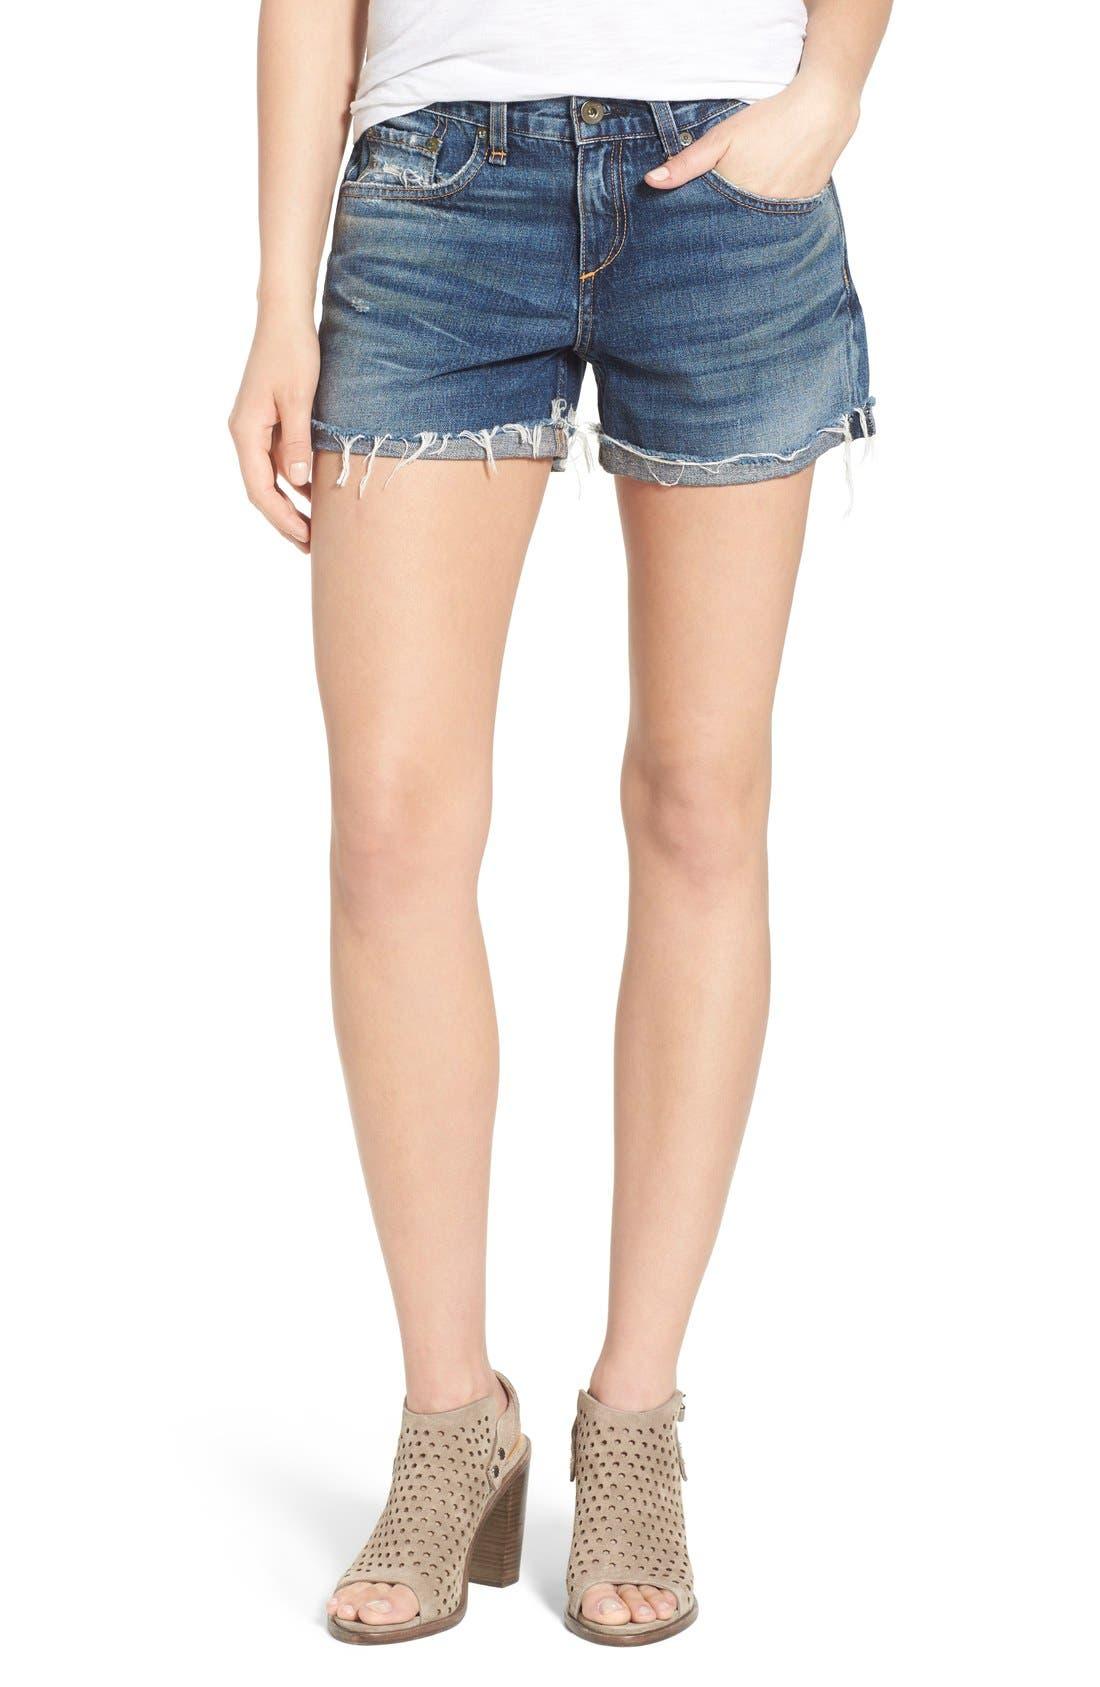 Alternate Image 1 Selected - rag & bone 'Boyfriend' Cutoff Denim Shorts (Woodstock)